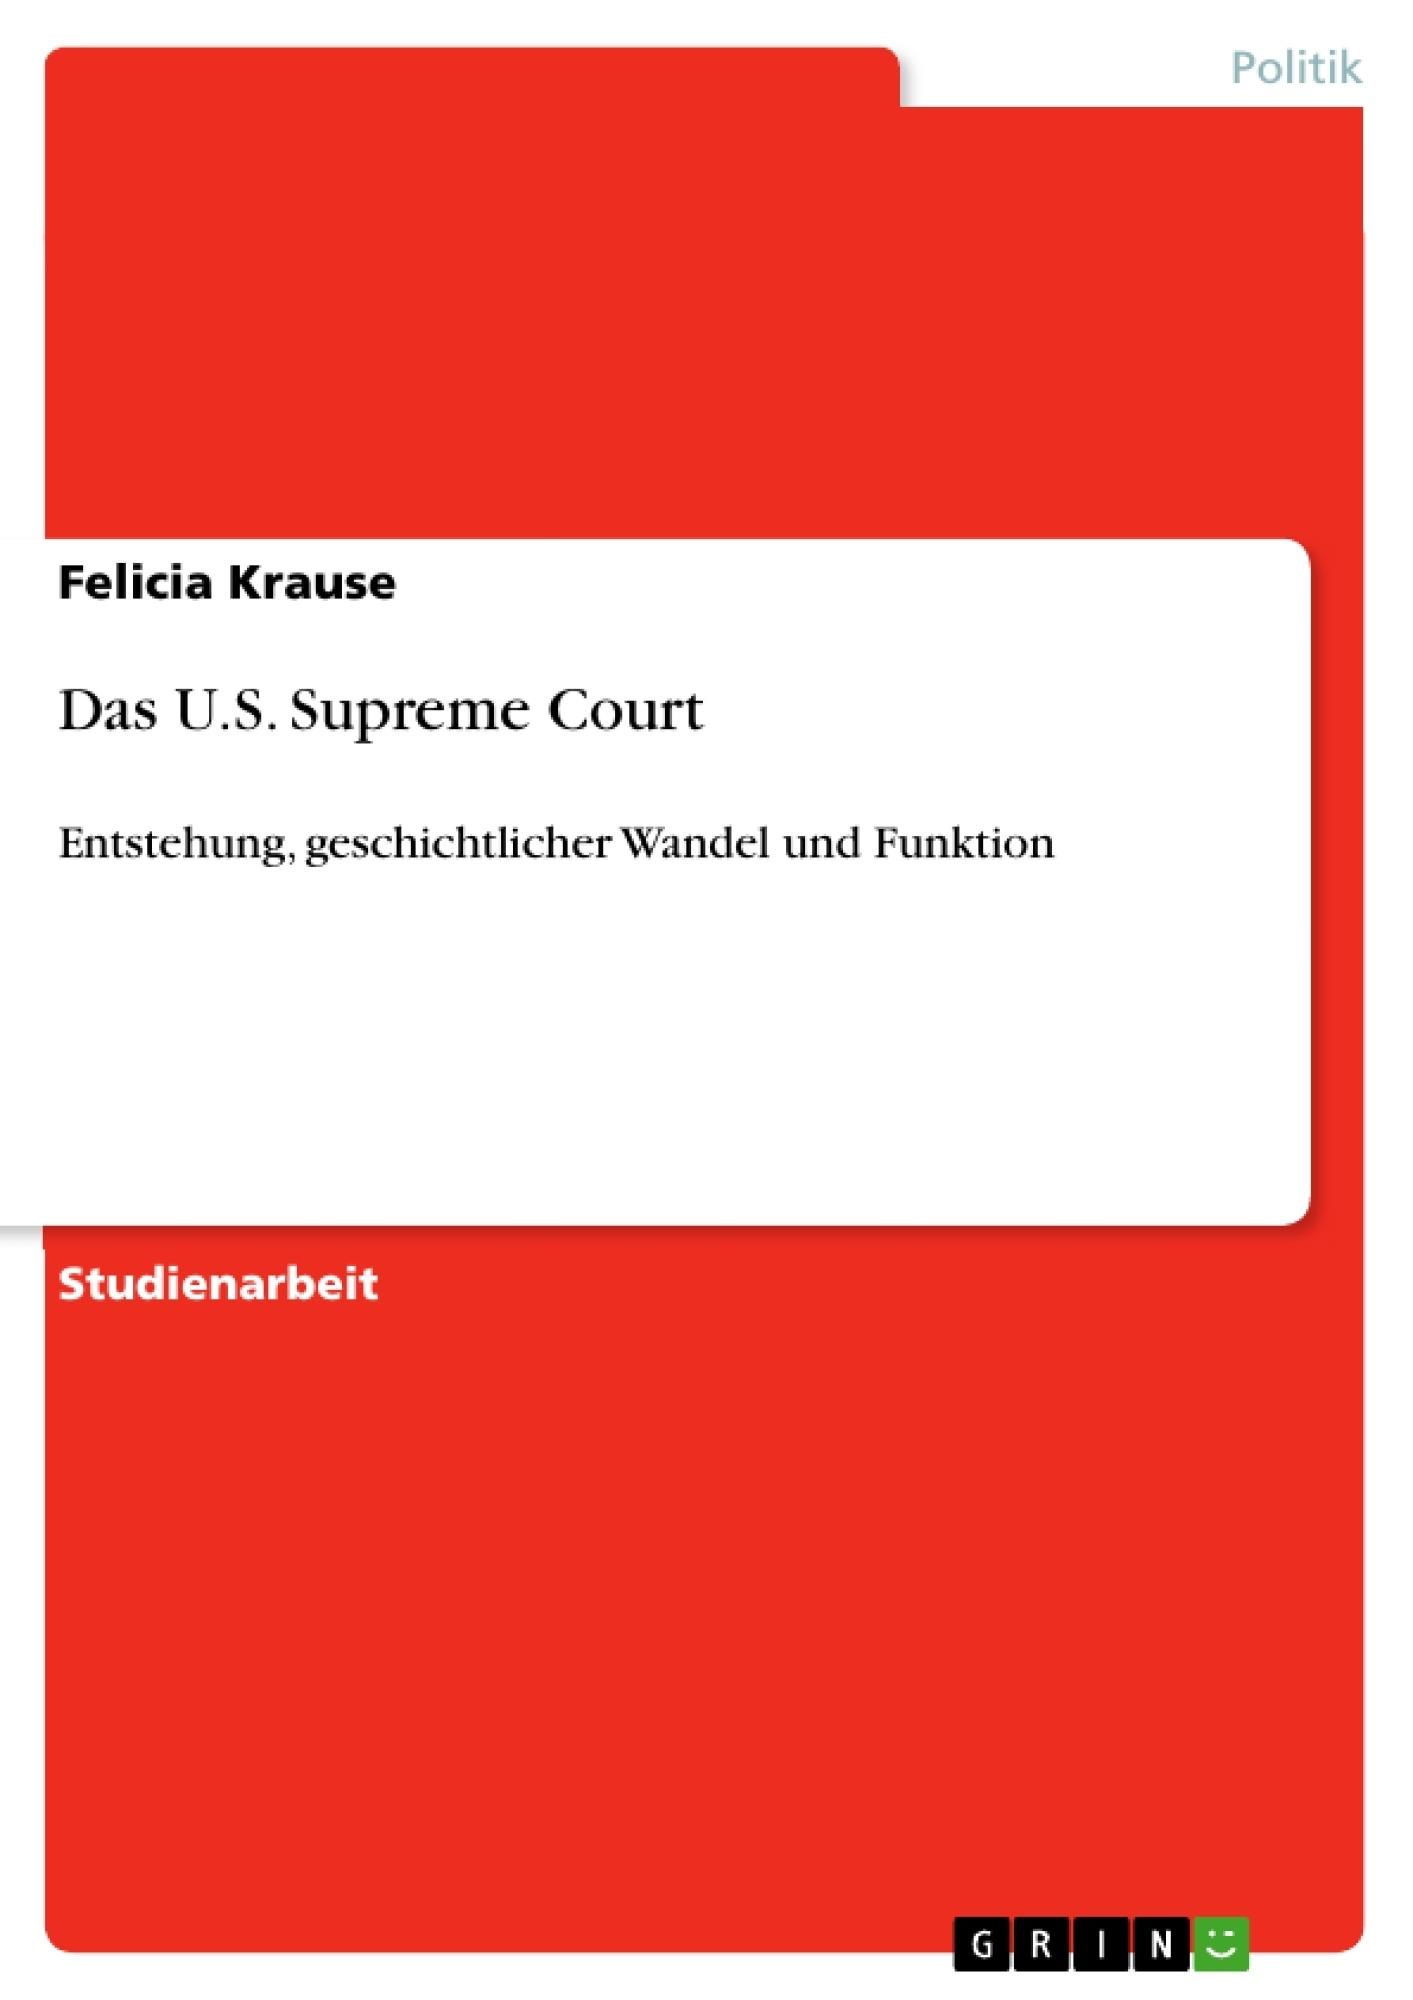 Titel: Das U.S. Supreme Court